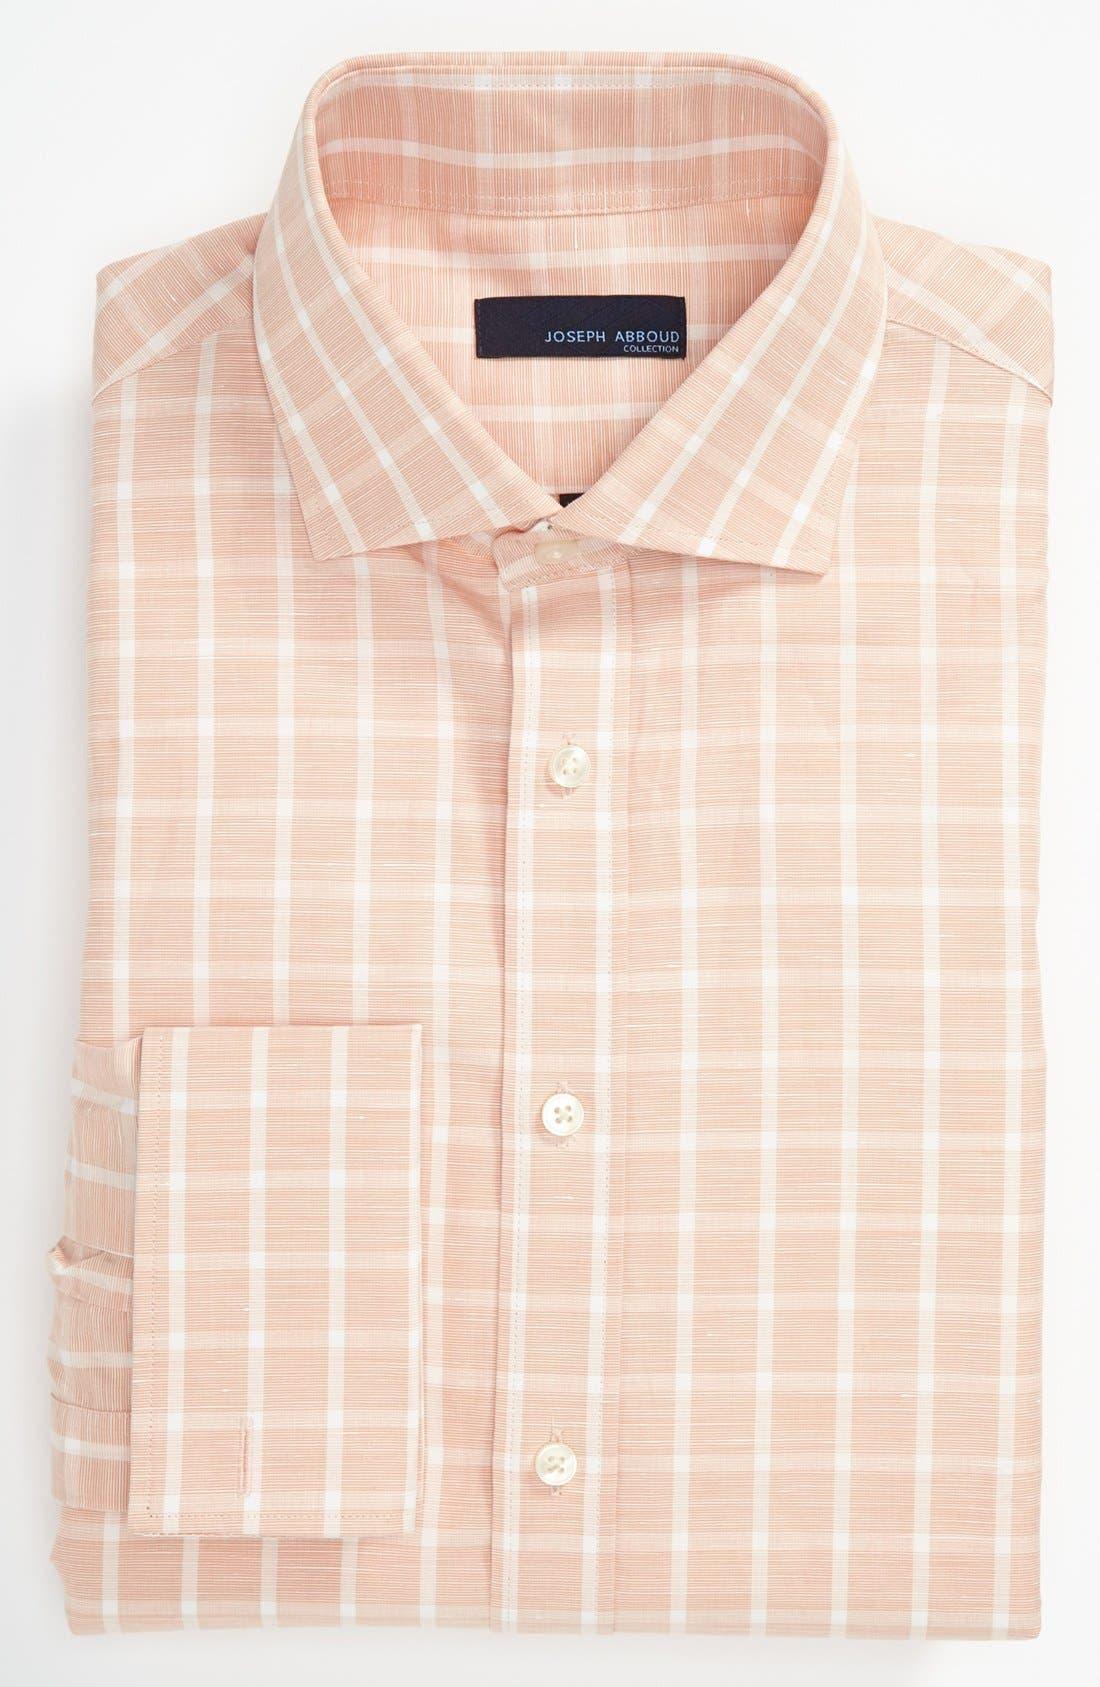 Alternate Image 1 Selected - Joseph Abboud Regular Fit Dress Shirt